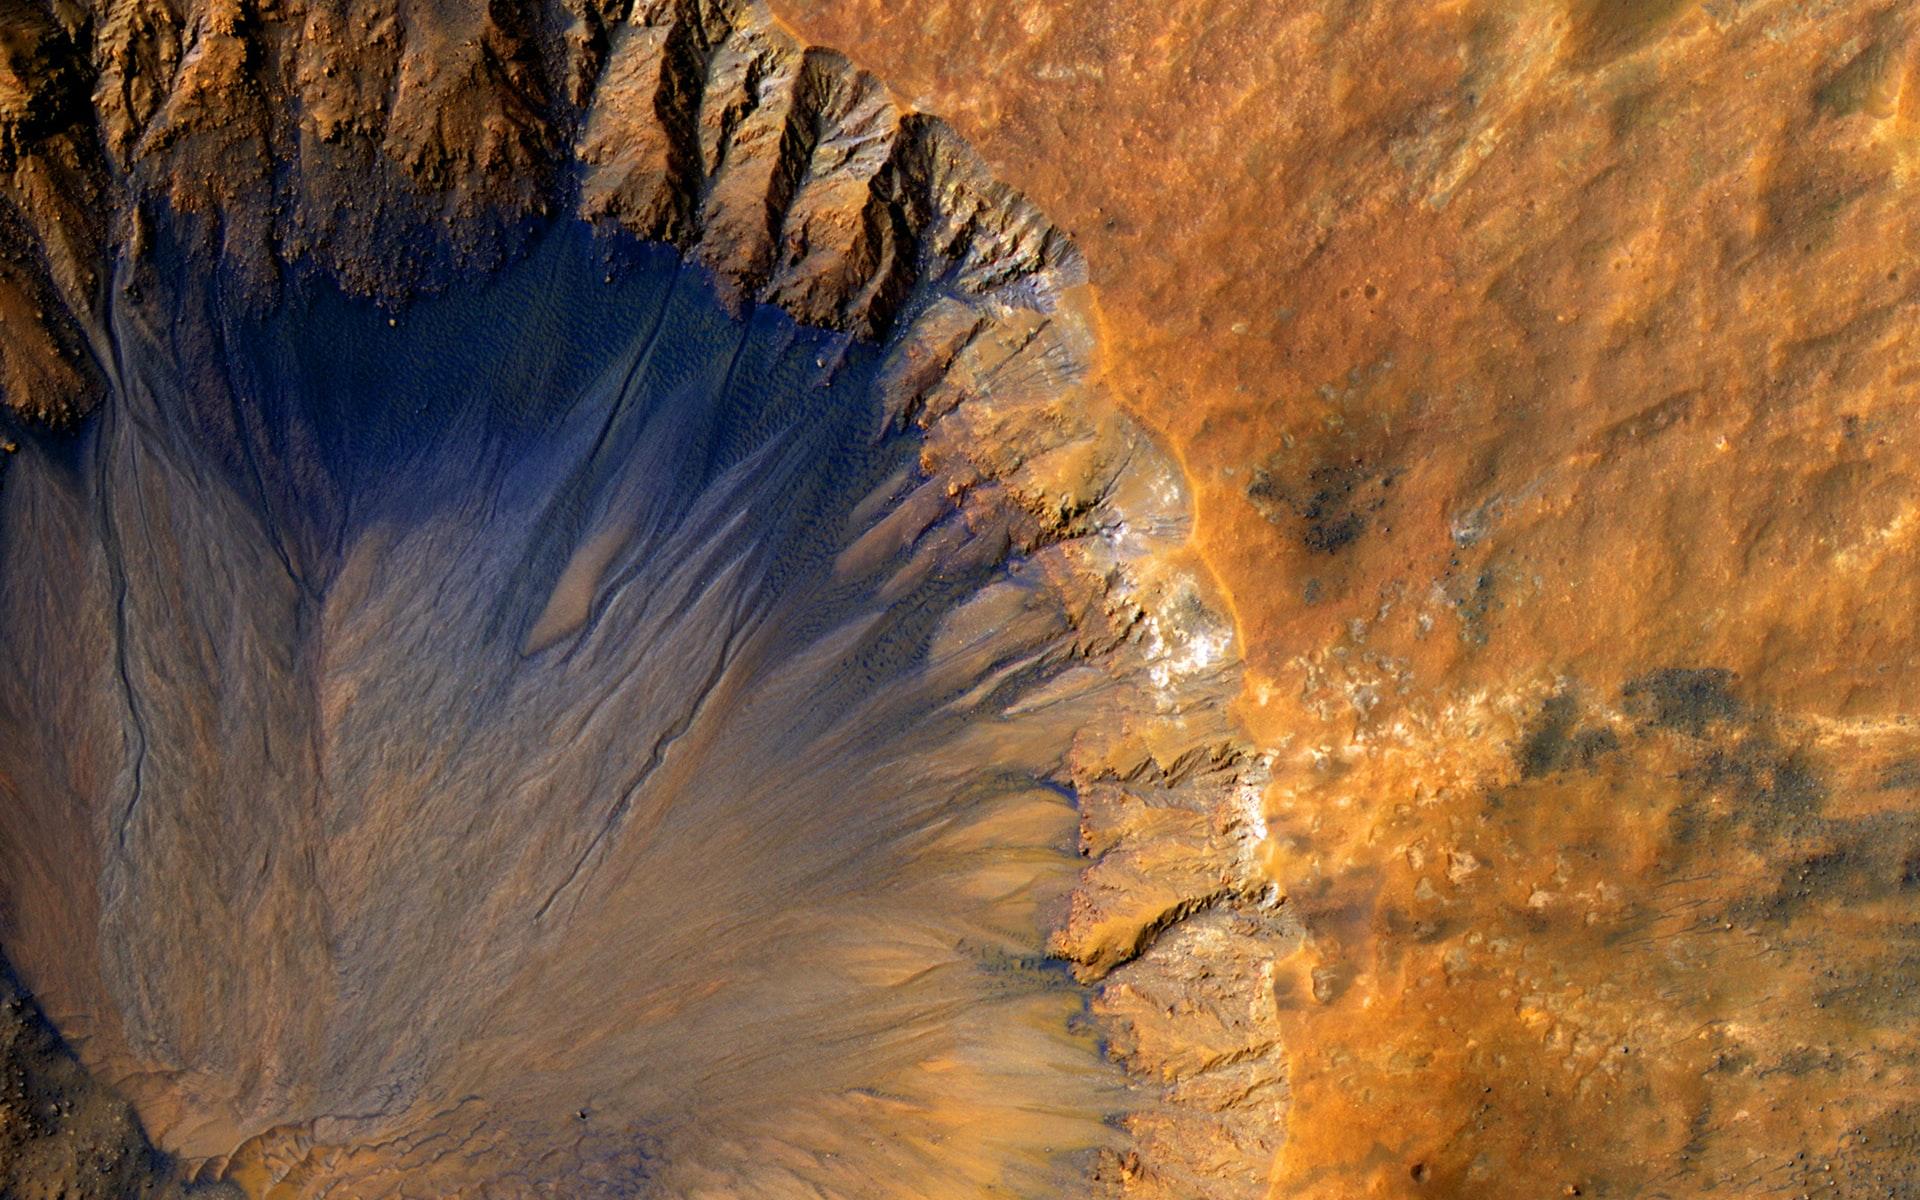 snimak sa marsa